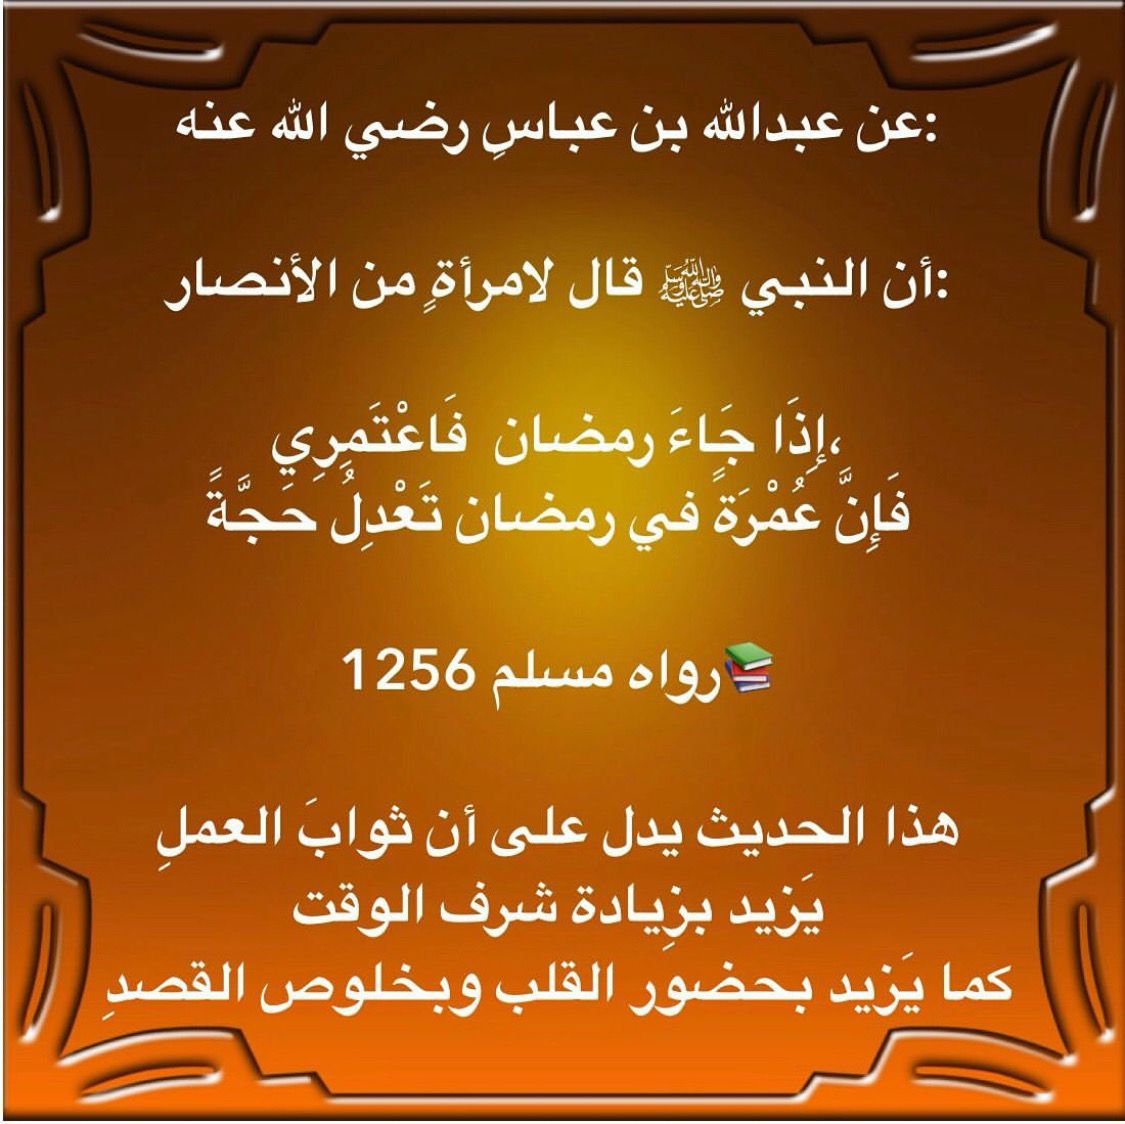 Pin By الأثر الجميل On شهر رمضان Ramadan Calligraphy Arabic Calligraphy